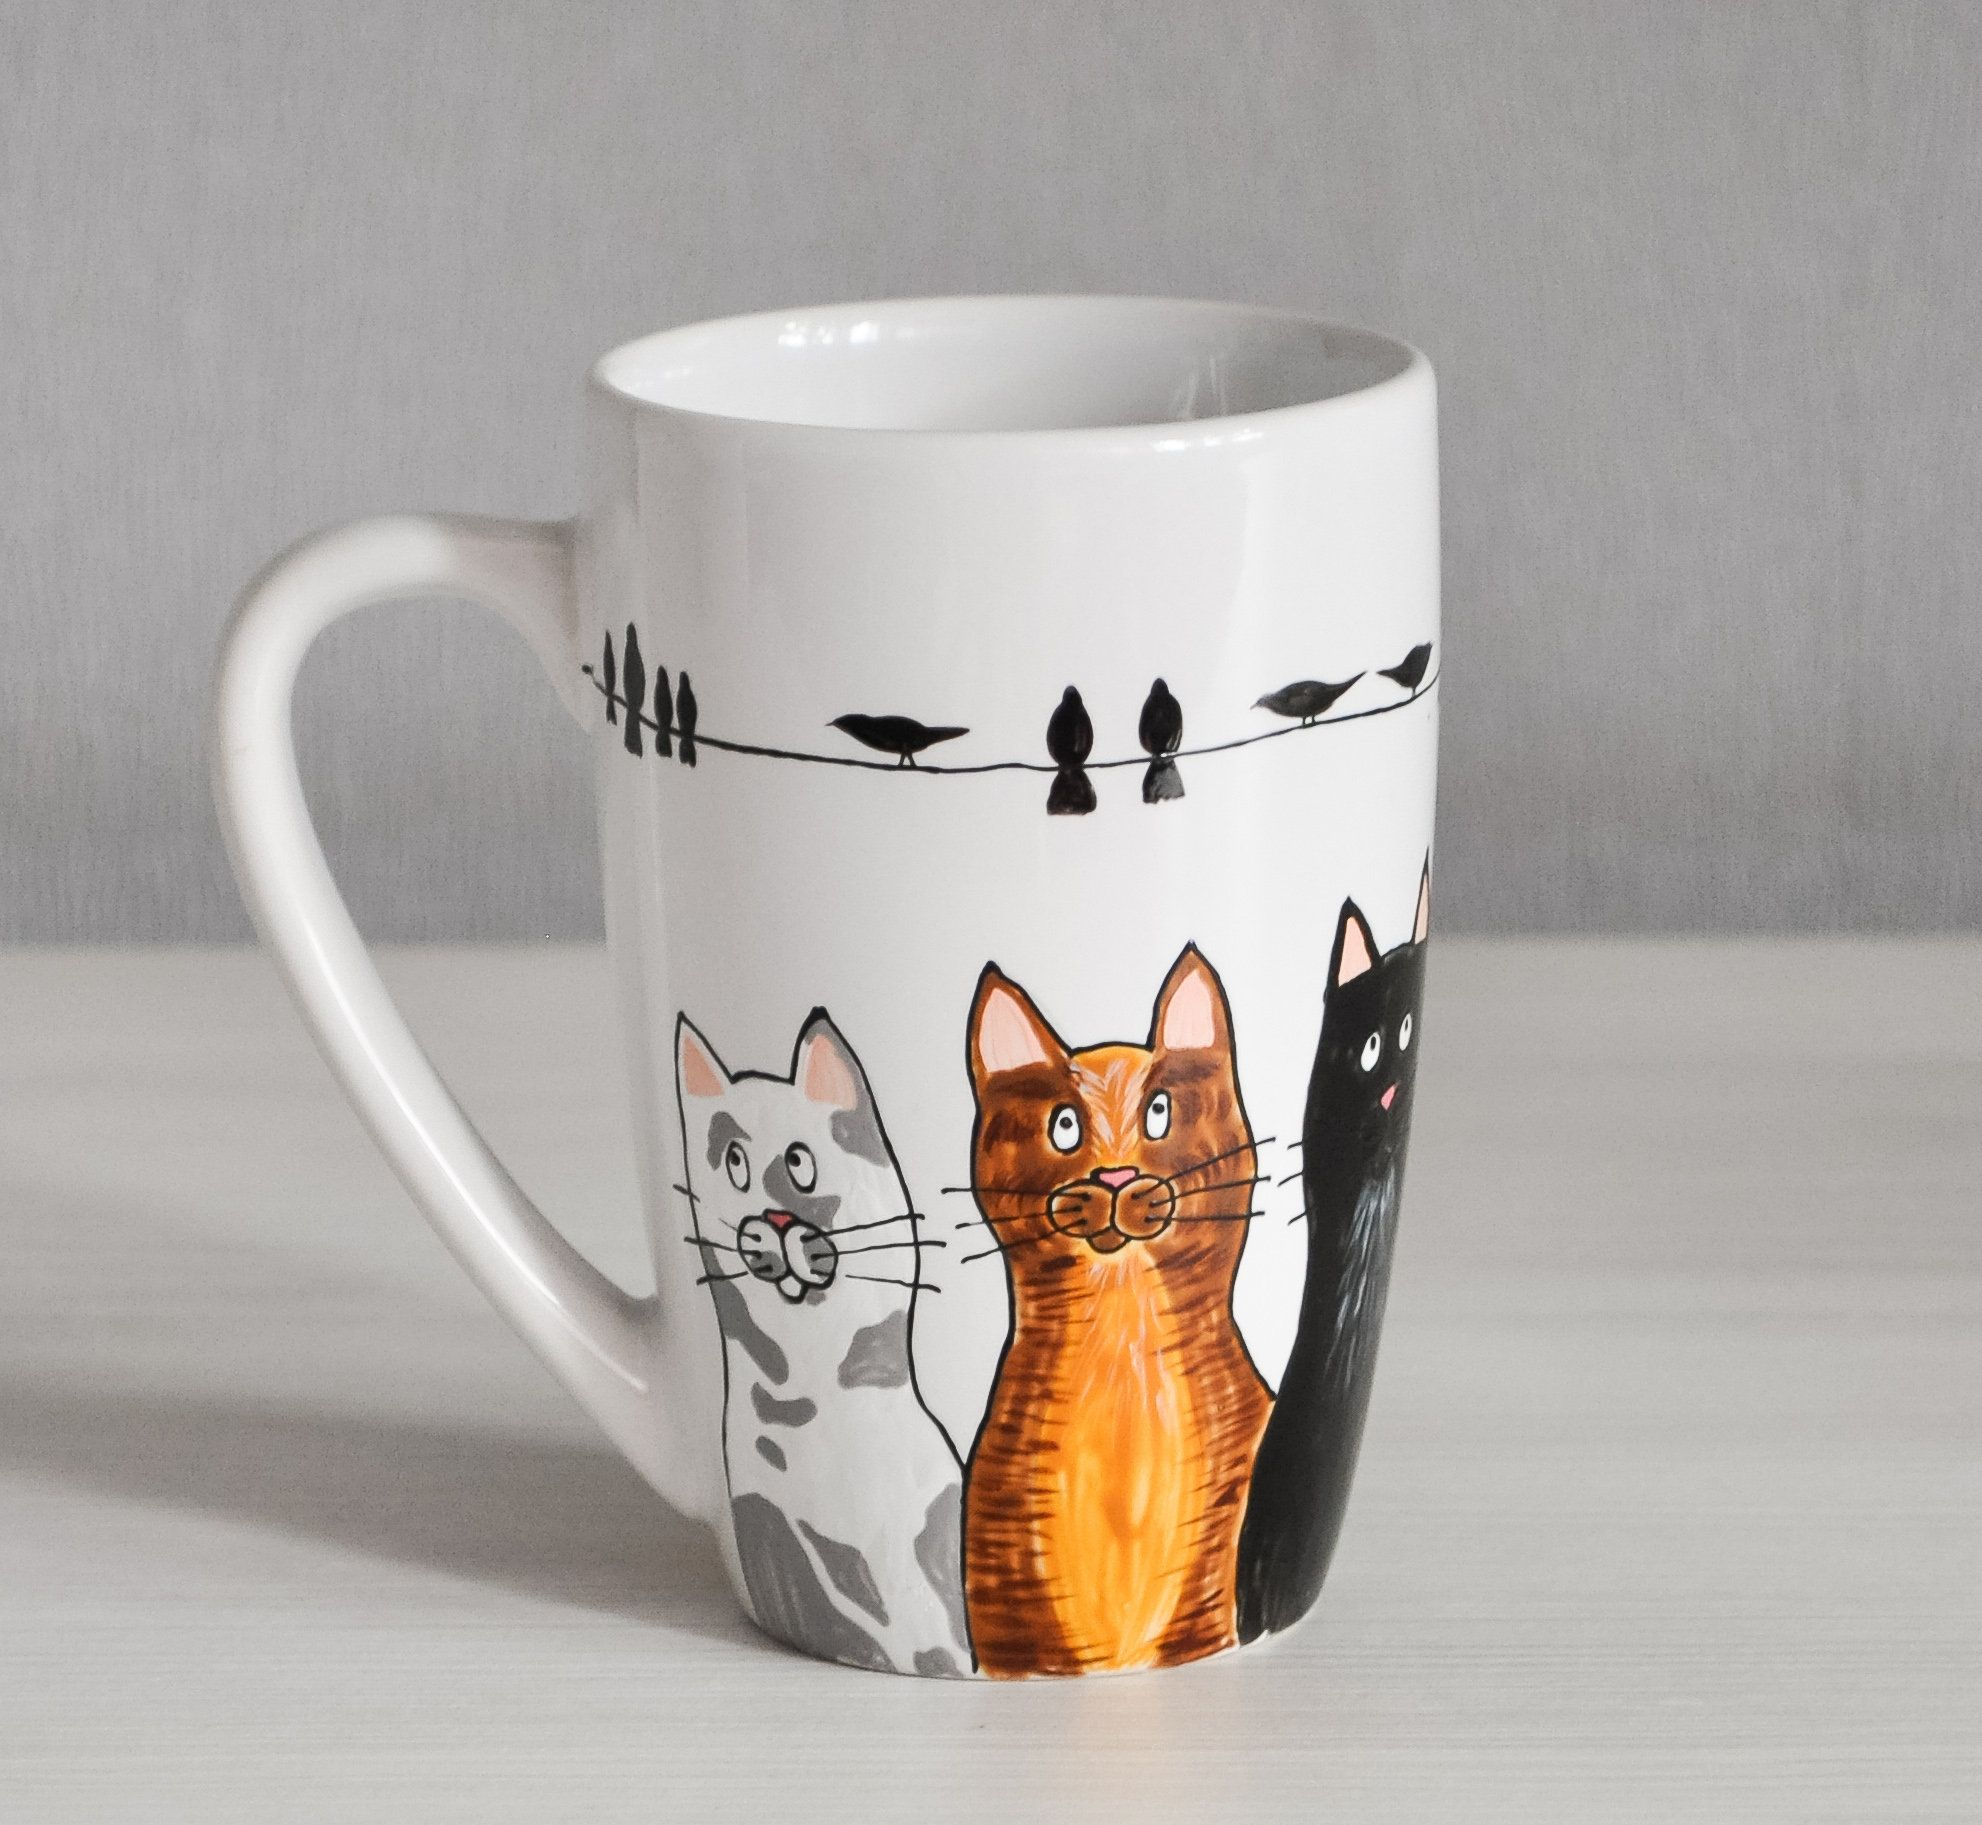 Cat Tea Cup Cat Lovers Mug Painted Coffee Mug Funny Coffee Etsy In 2020 Cat Coffee Mug Painted Coffee Mugs Mugs